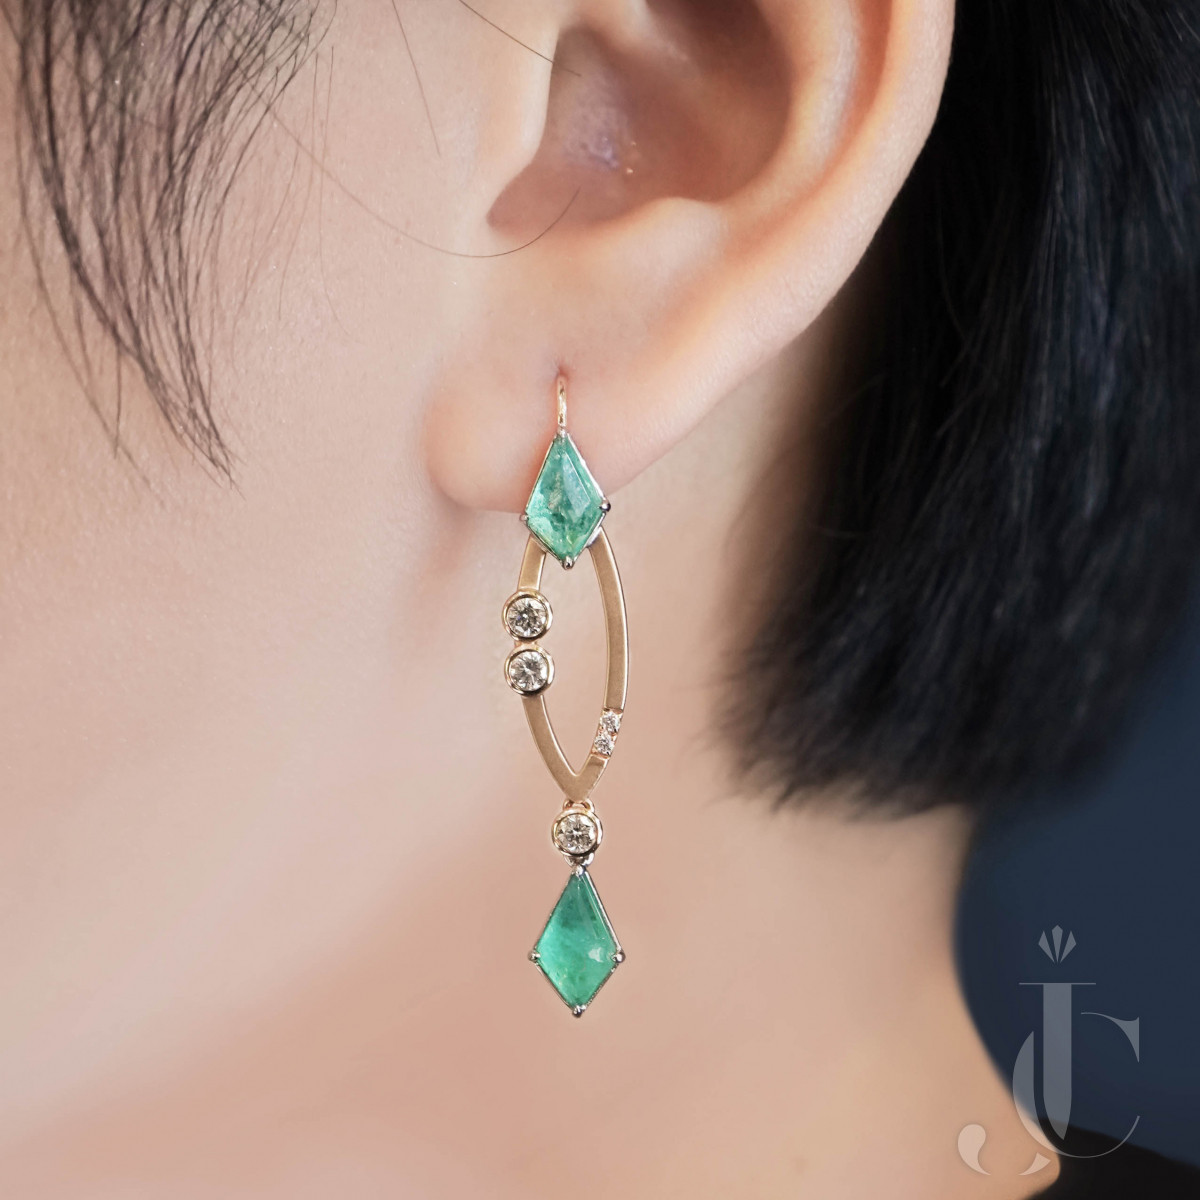 18K Gold 3.35 Carat Kite Shaped Colombia Emeralds & White Diamond Dangle Earring